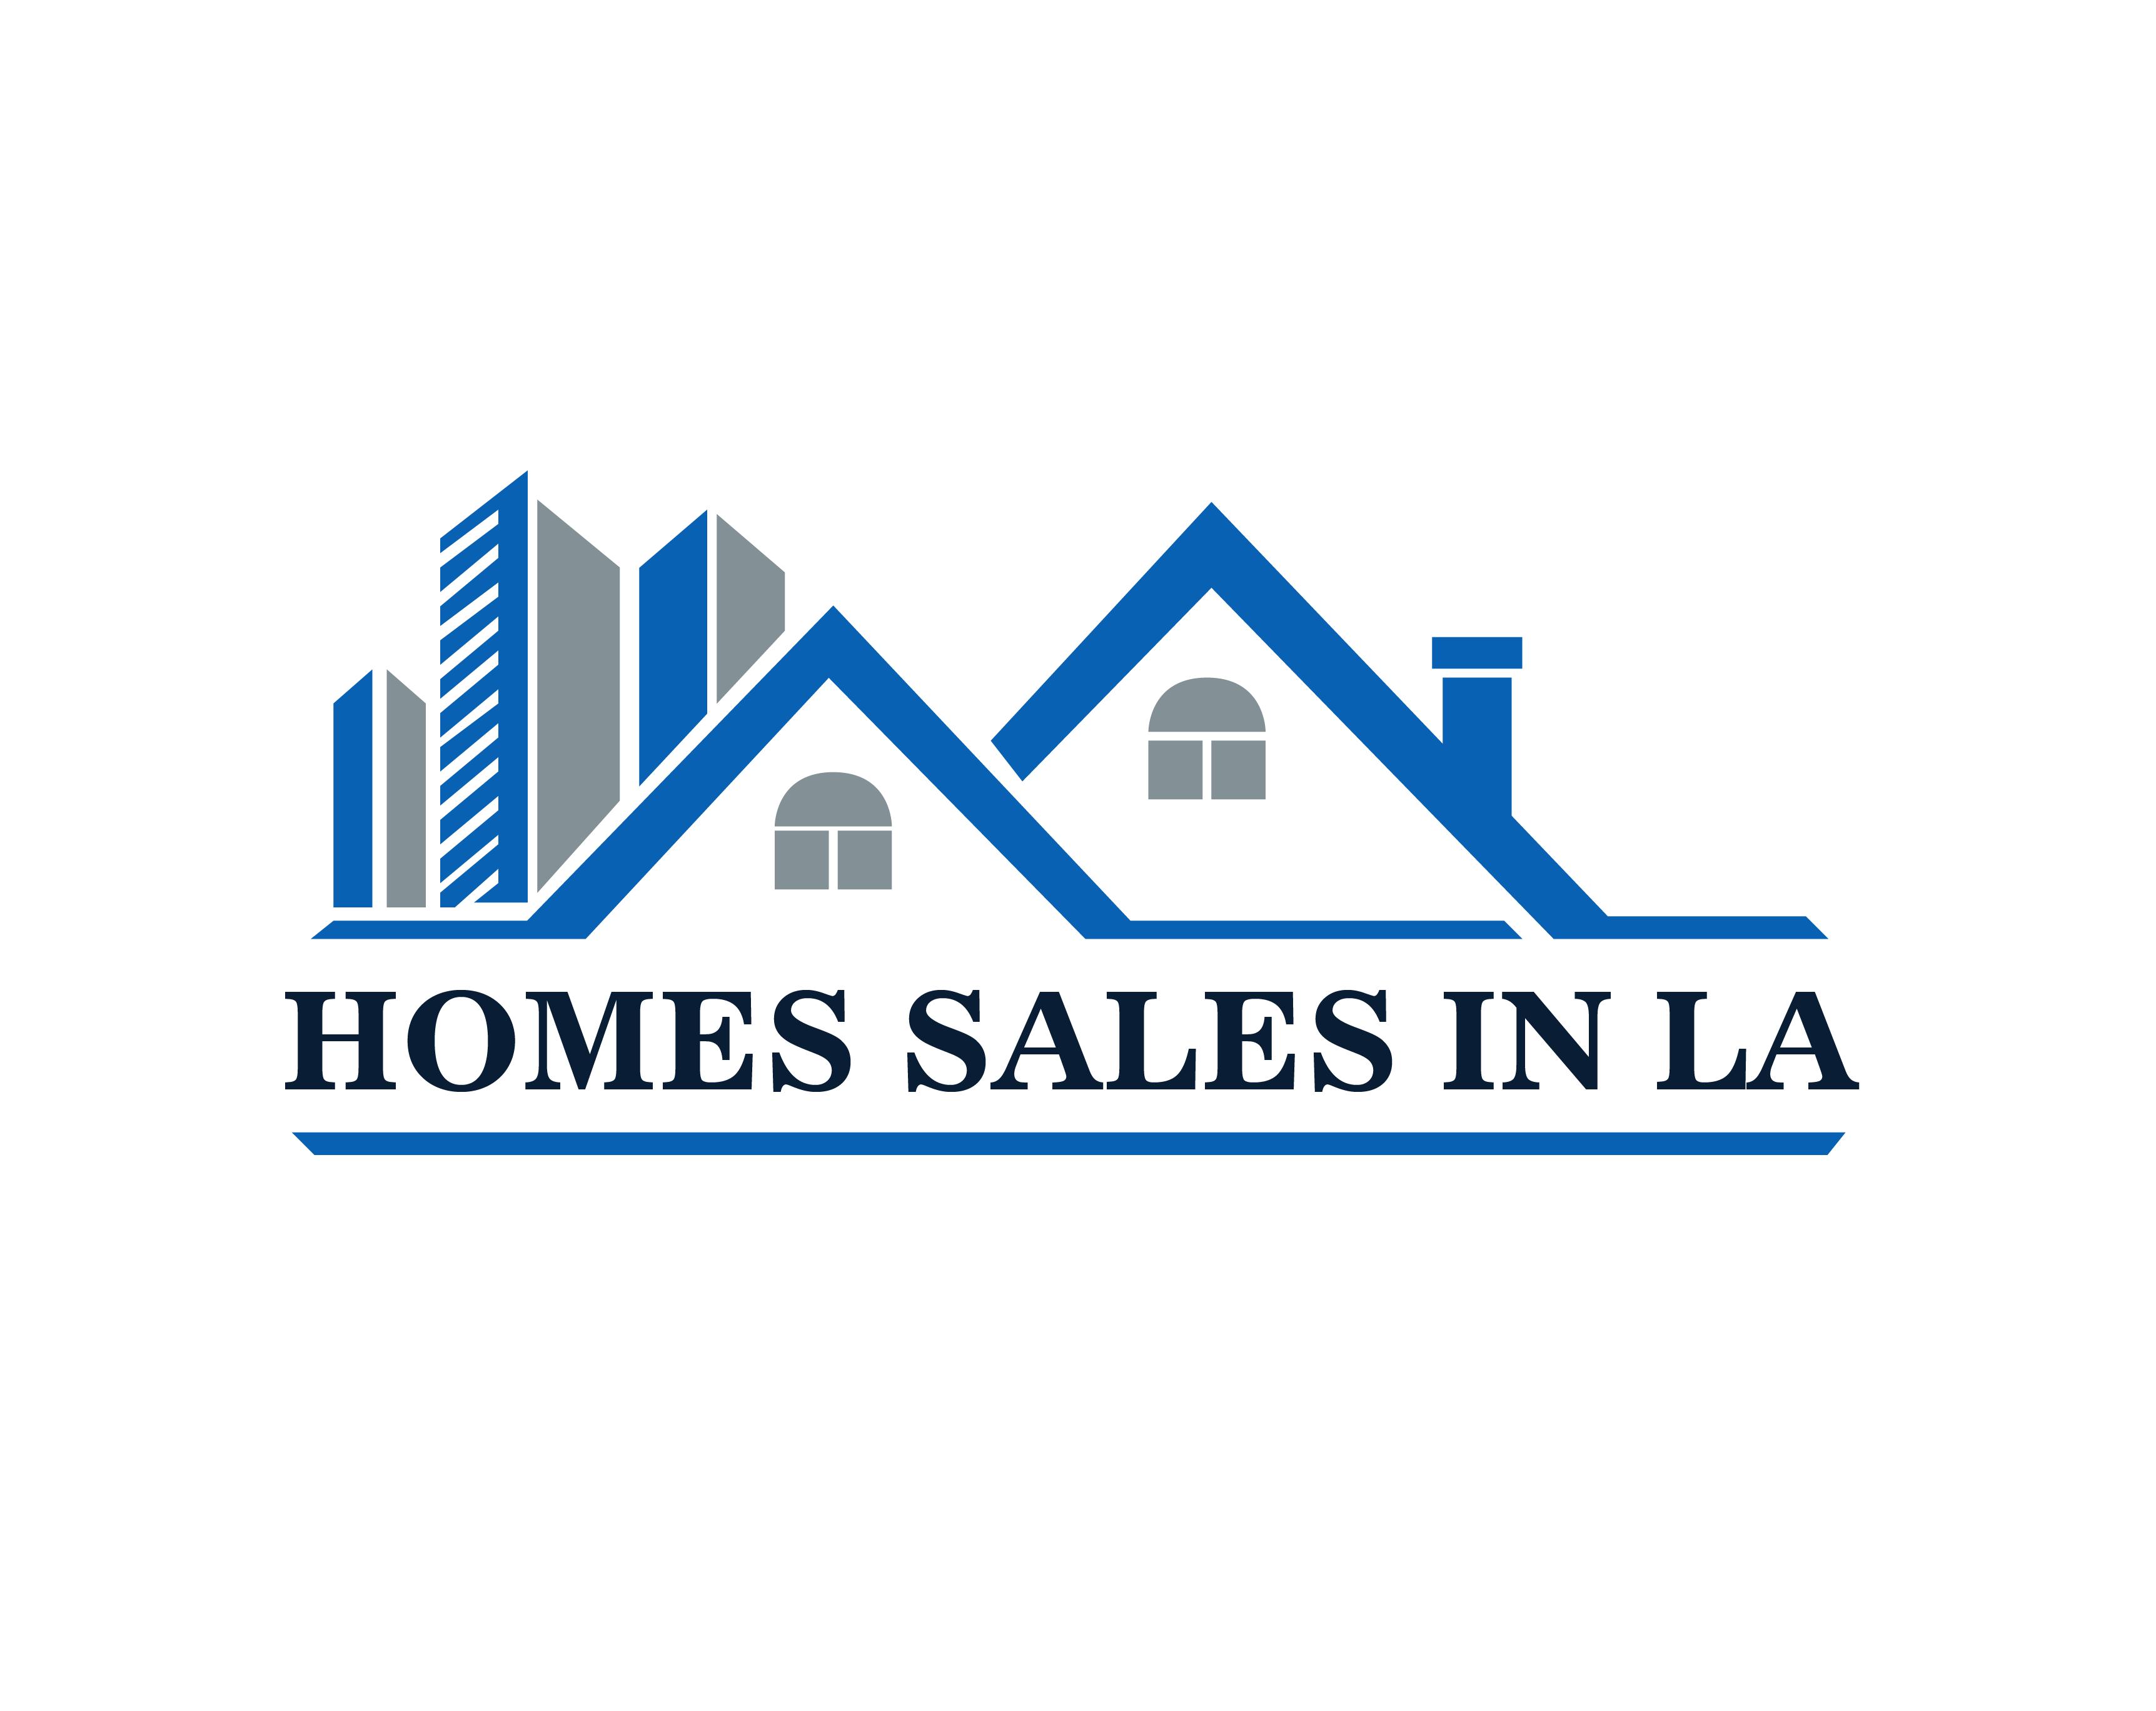 homes-sales-in-la-final.png